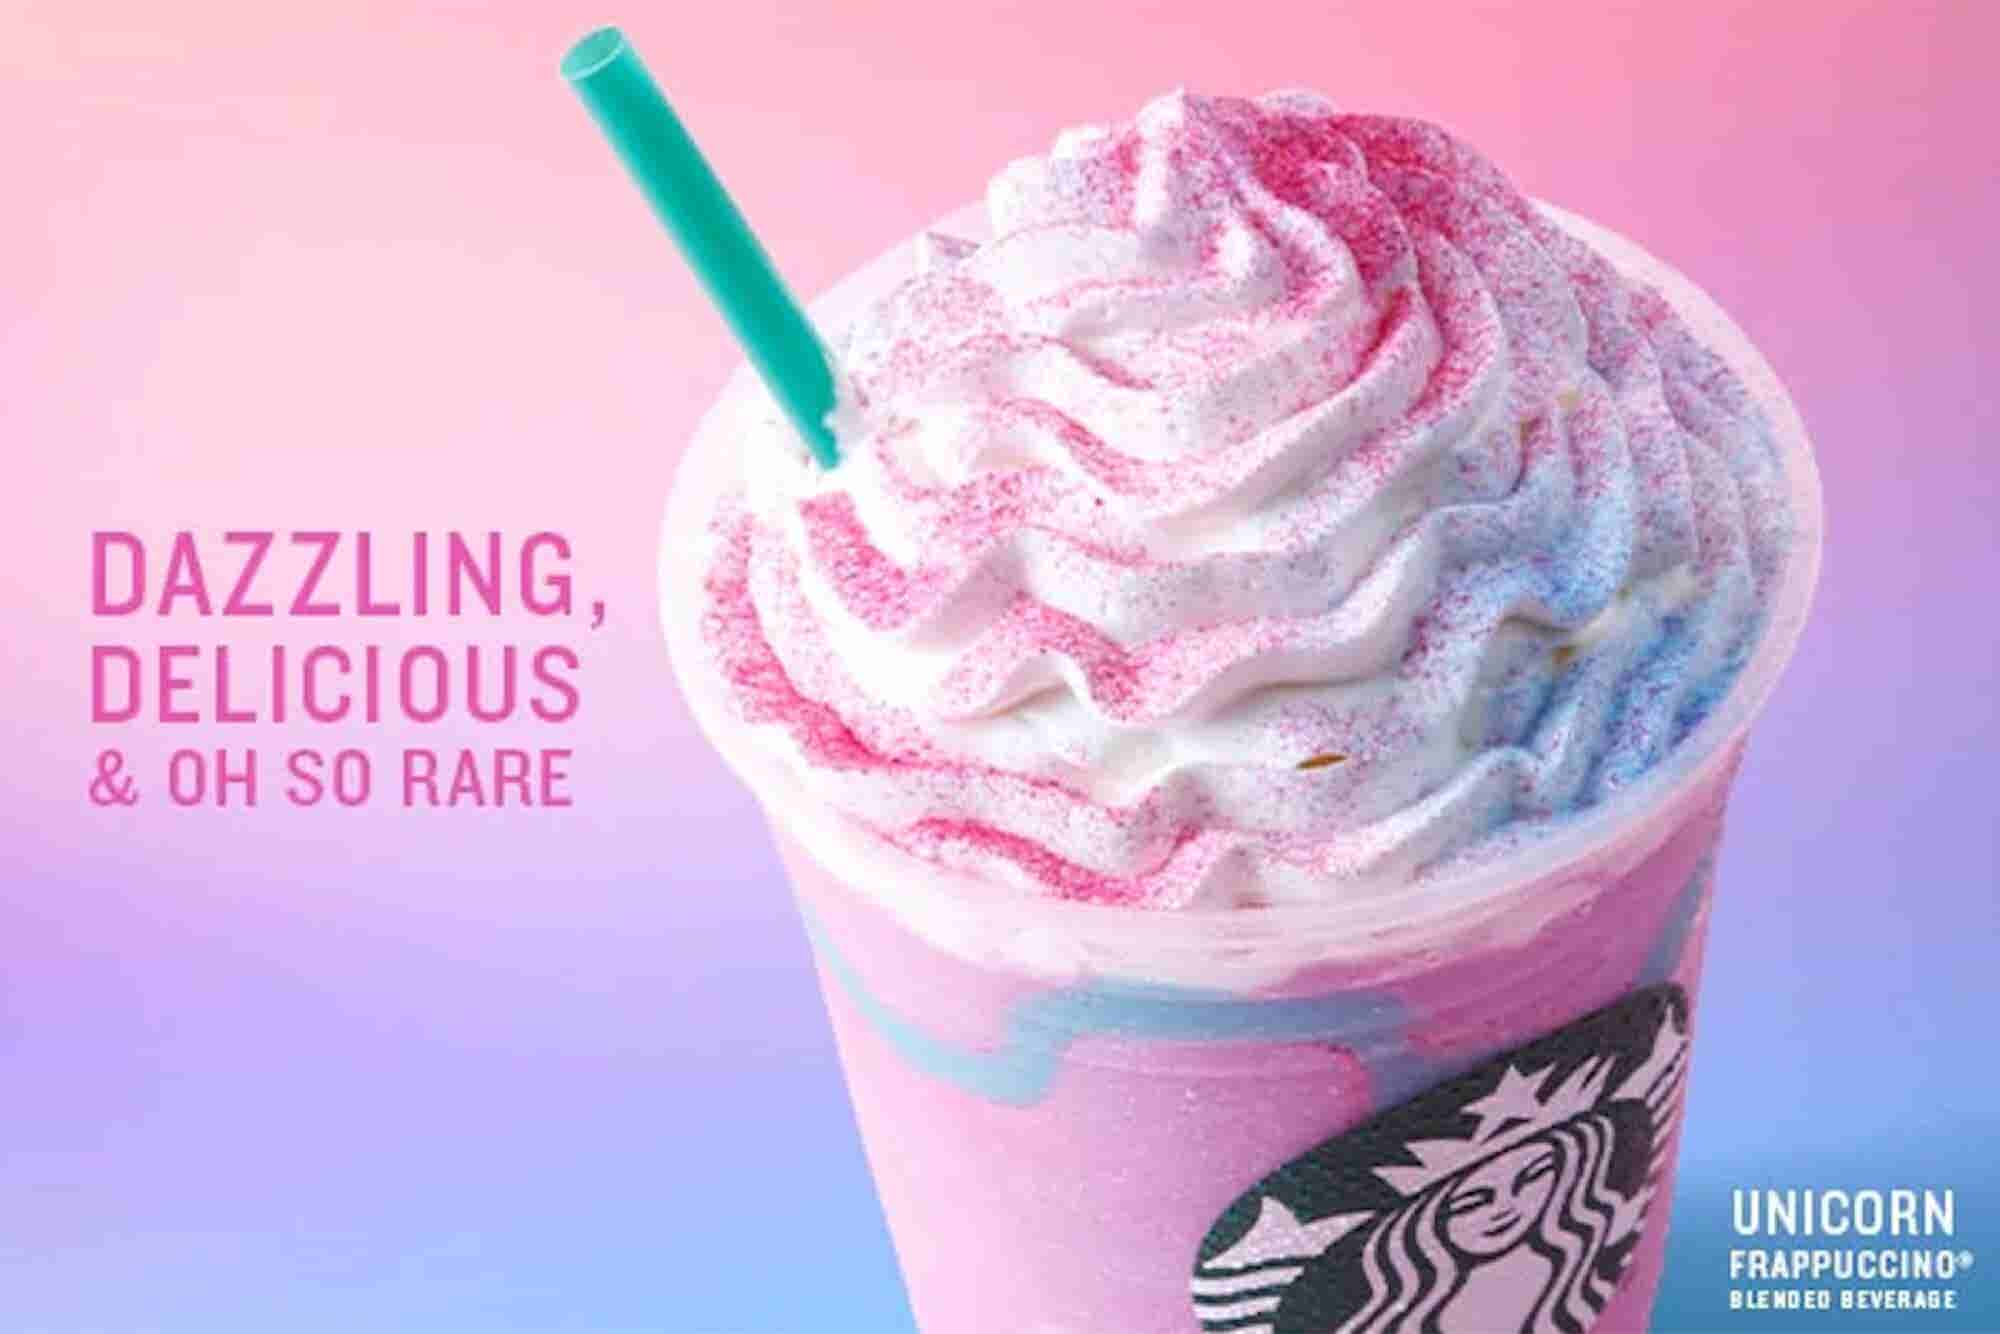 Starbucks Barista Serves Up Viral Unicorn Frappucino Rant